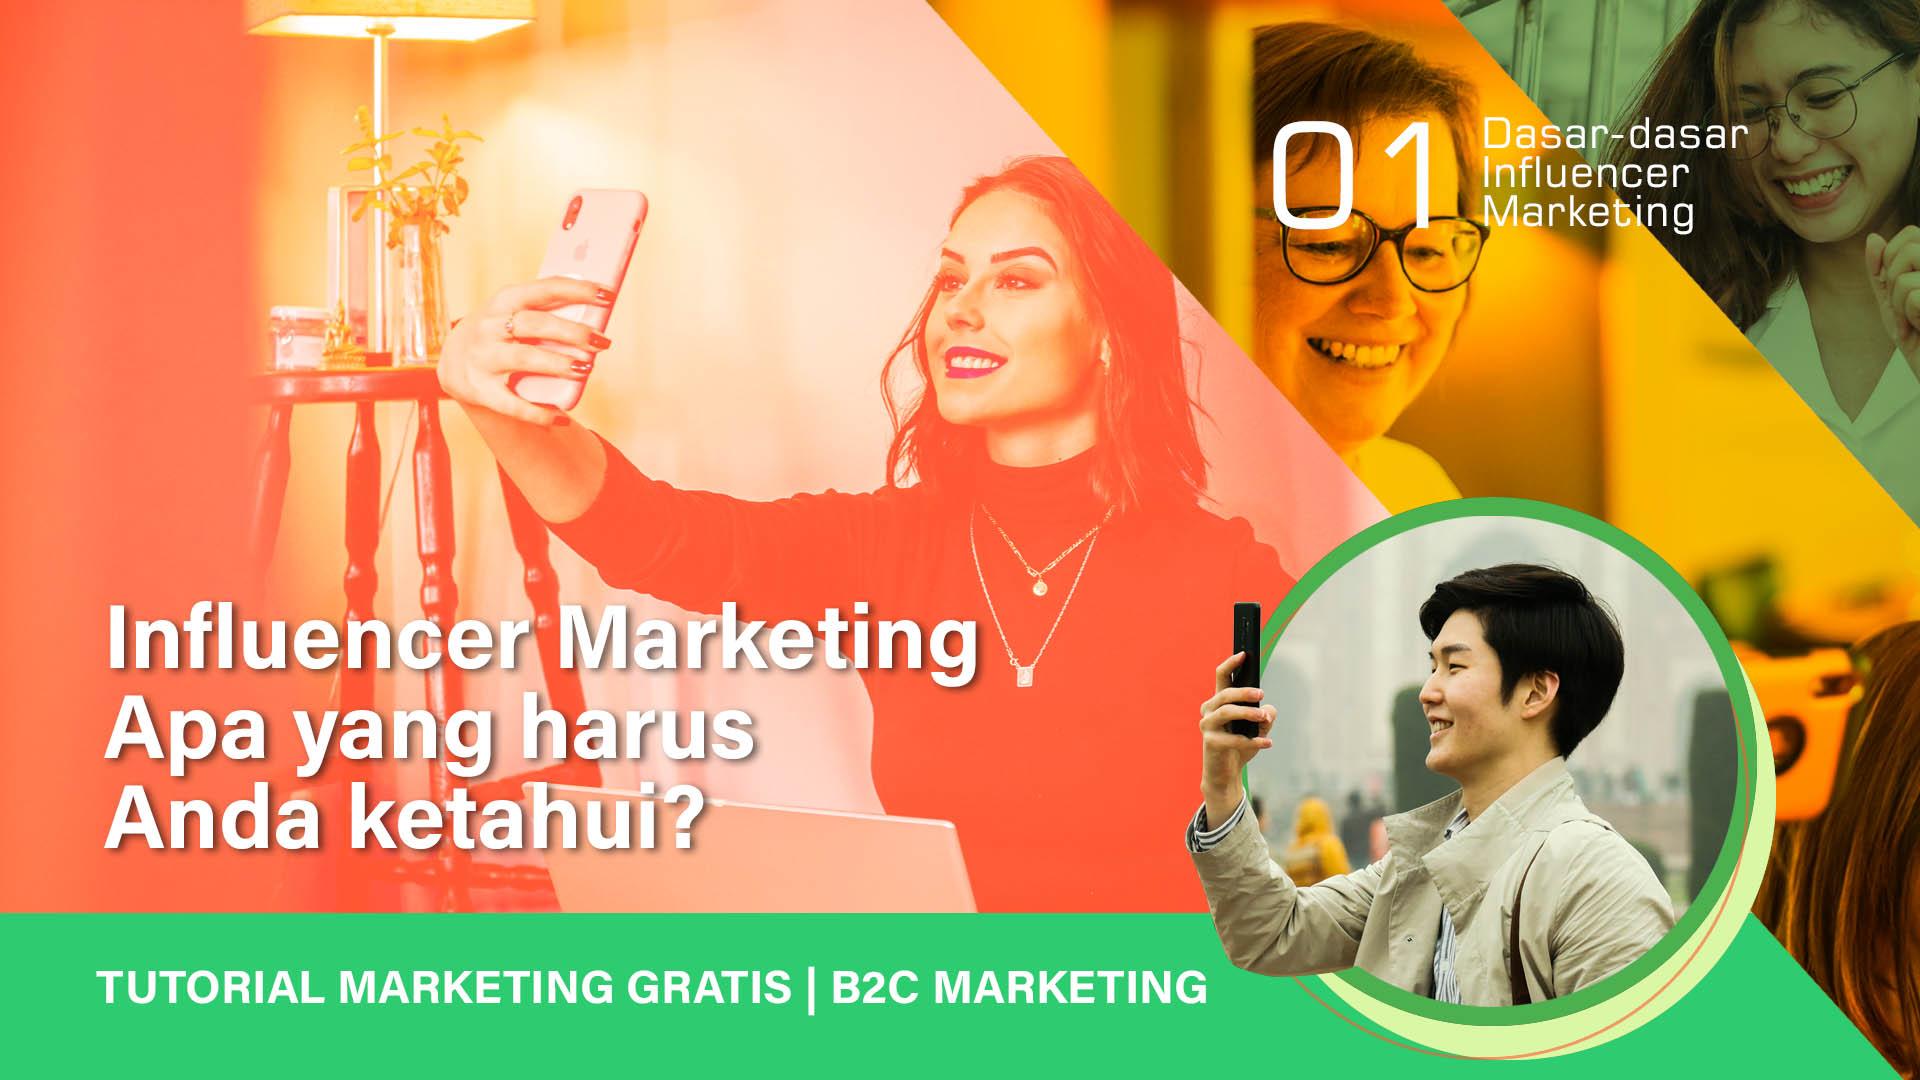 Influencer Marketing Apa Yang Harus Kita Ketahui